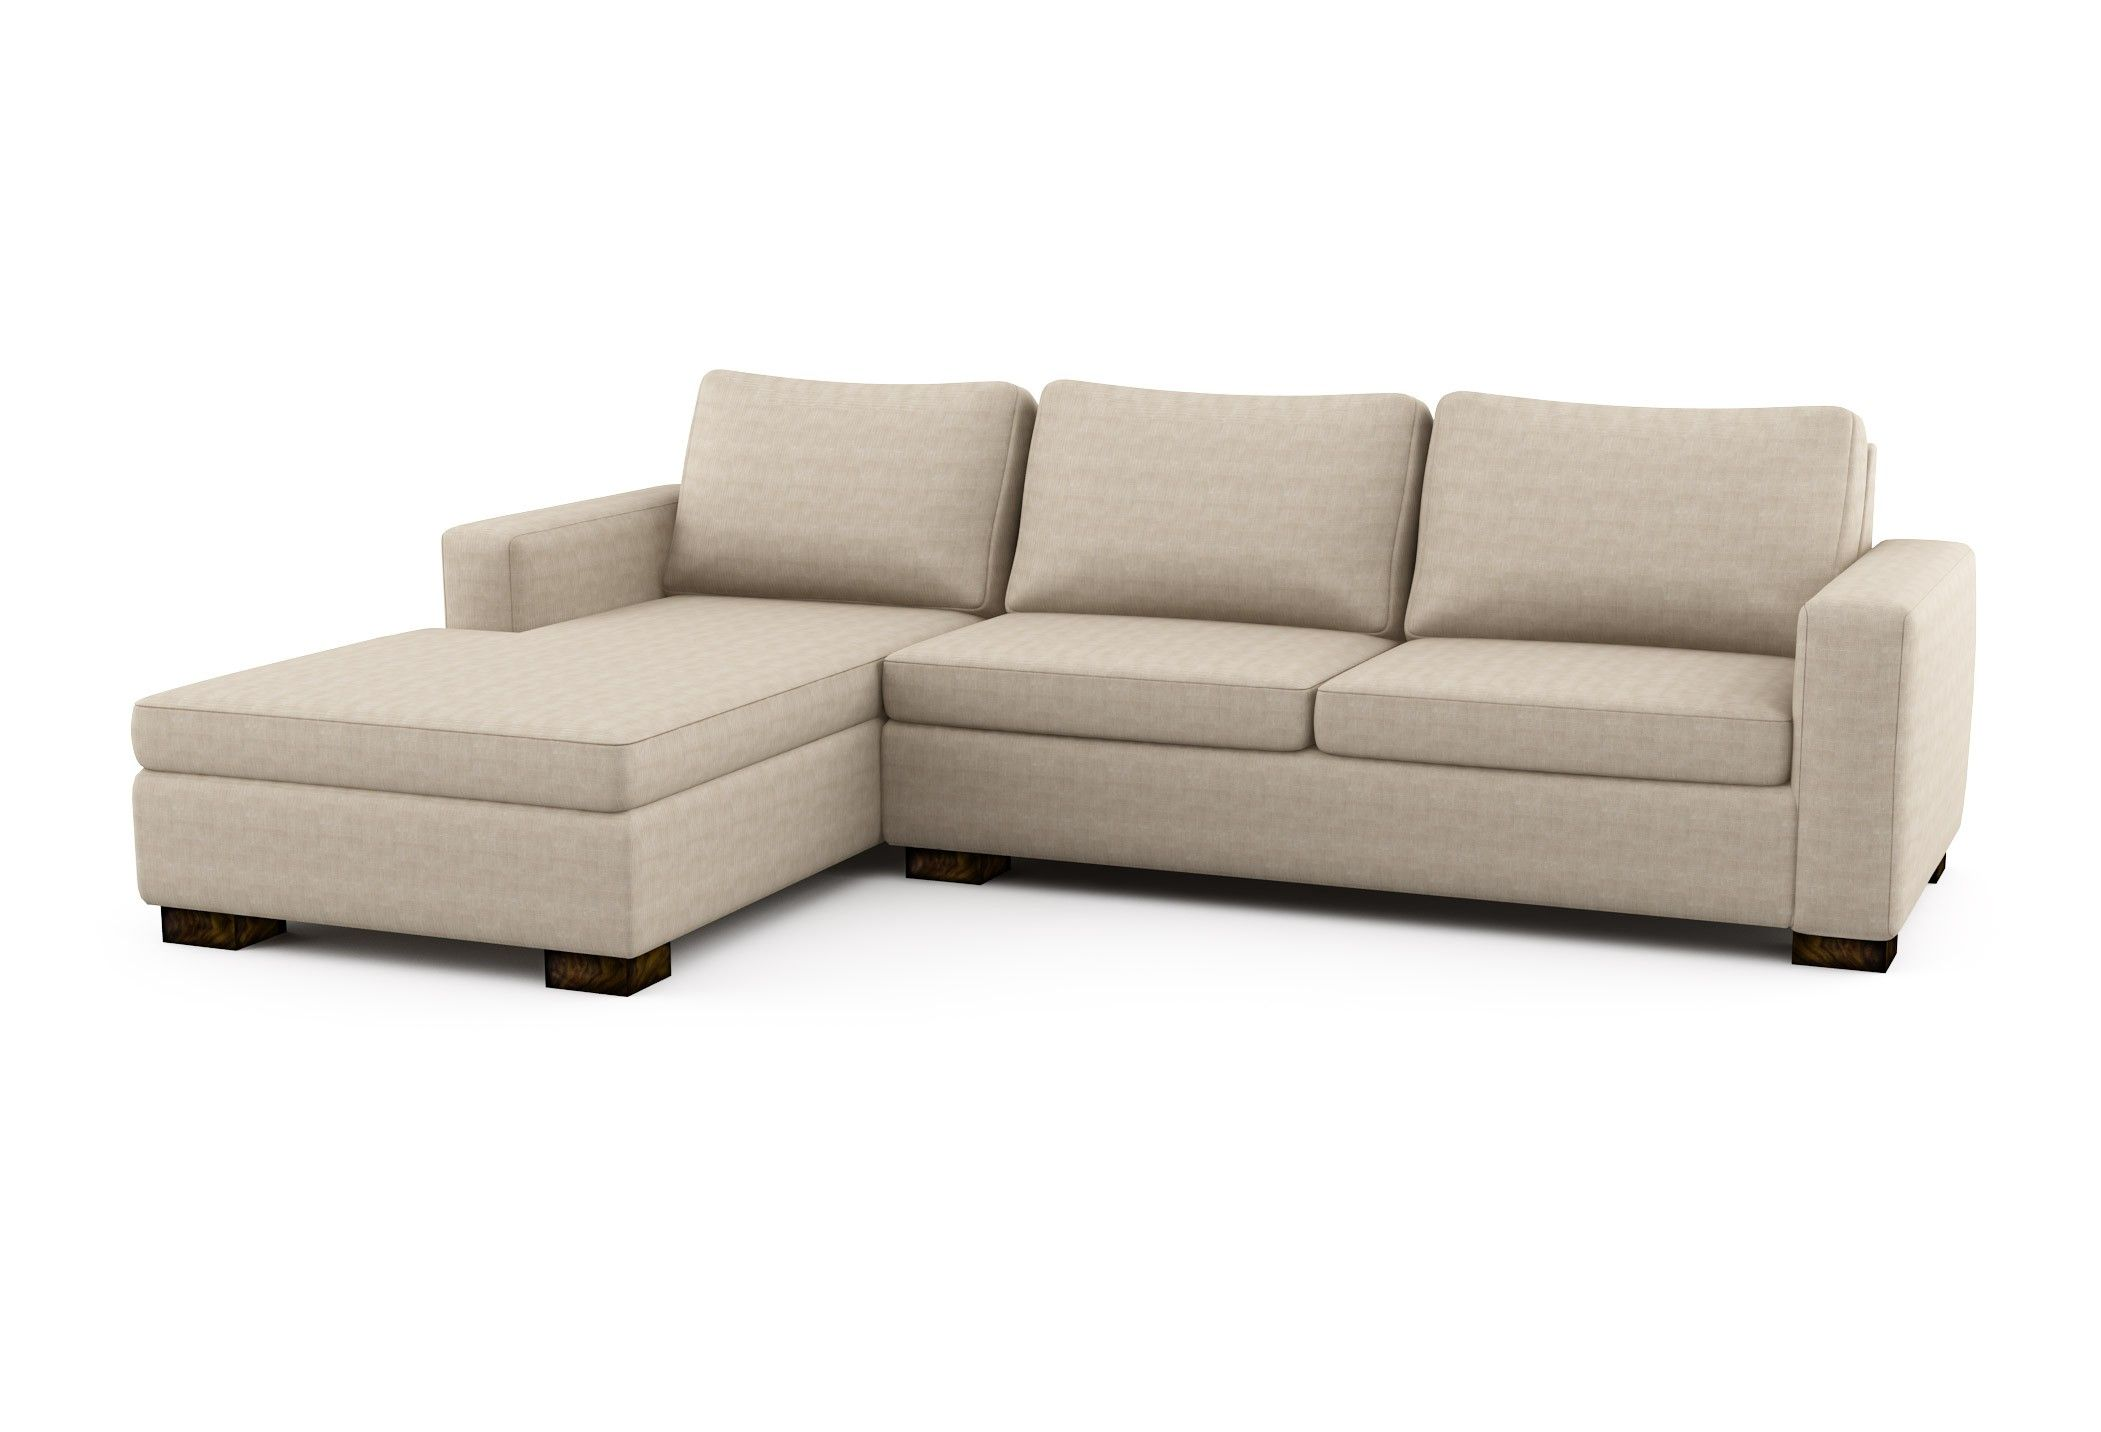 sofasandmore modern sectional sofas tampa rio chaise left w sofa bed custom 4 370 00